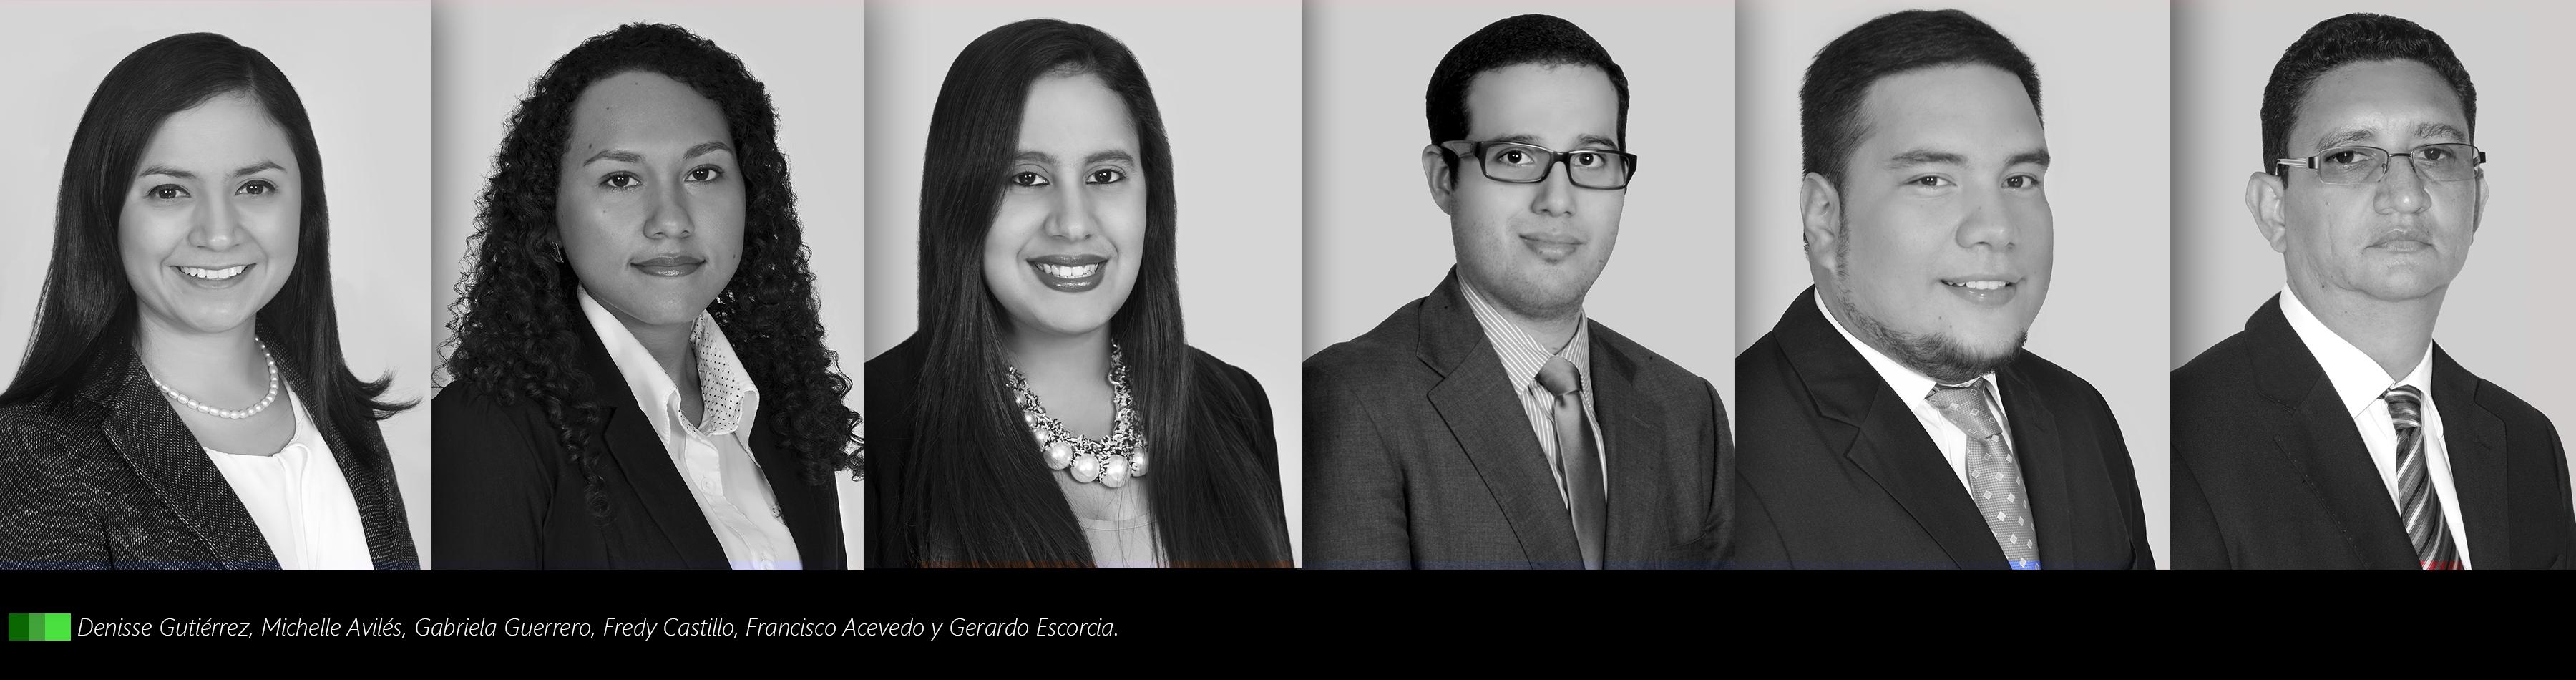 servicios legales especializados en Centroamérica